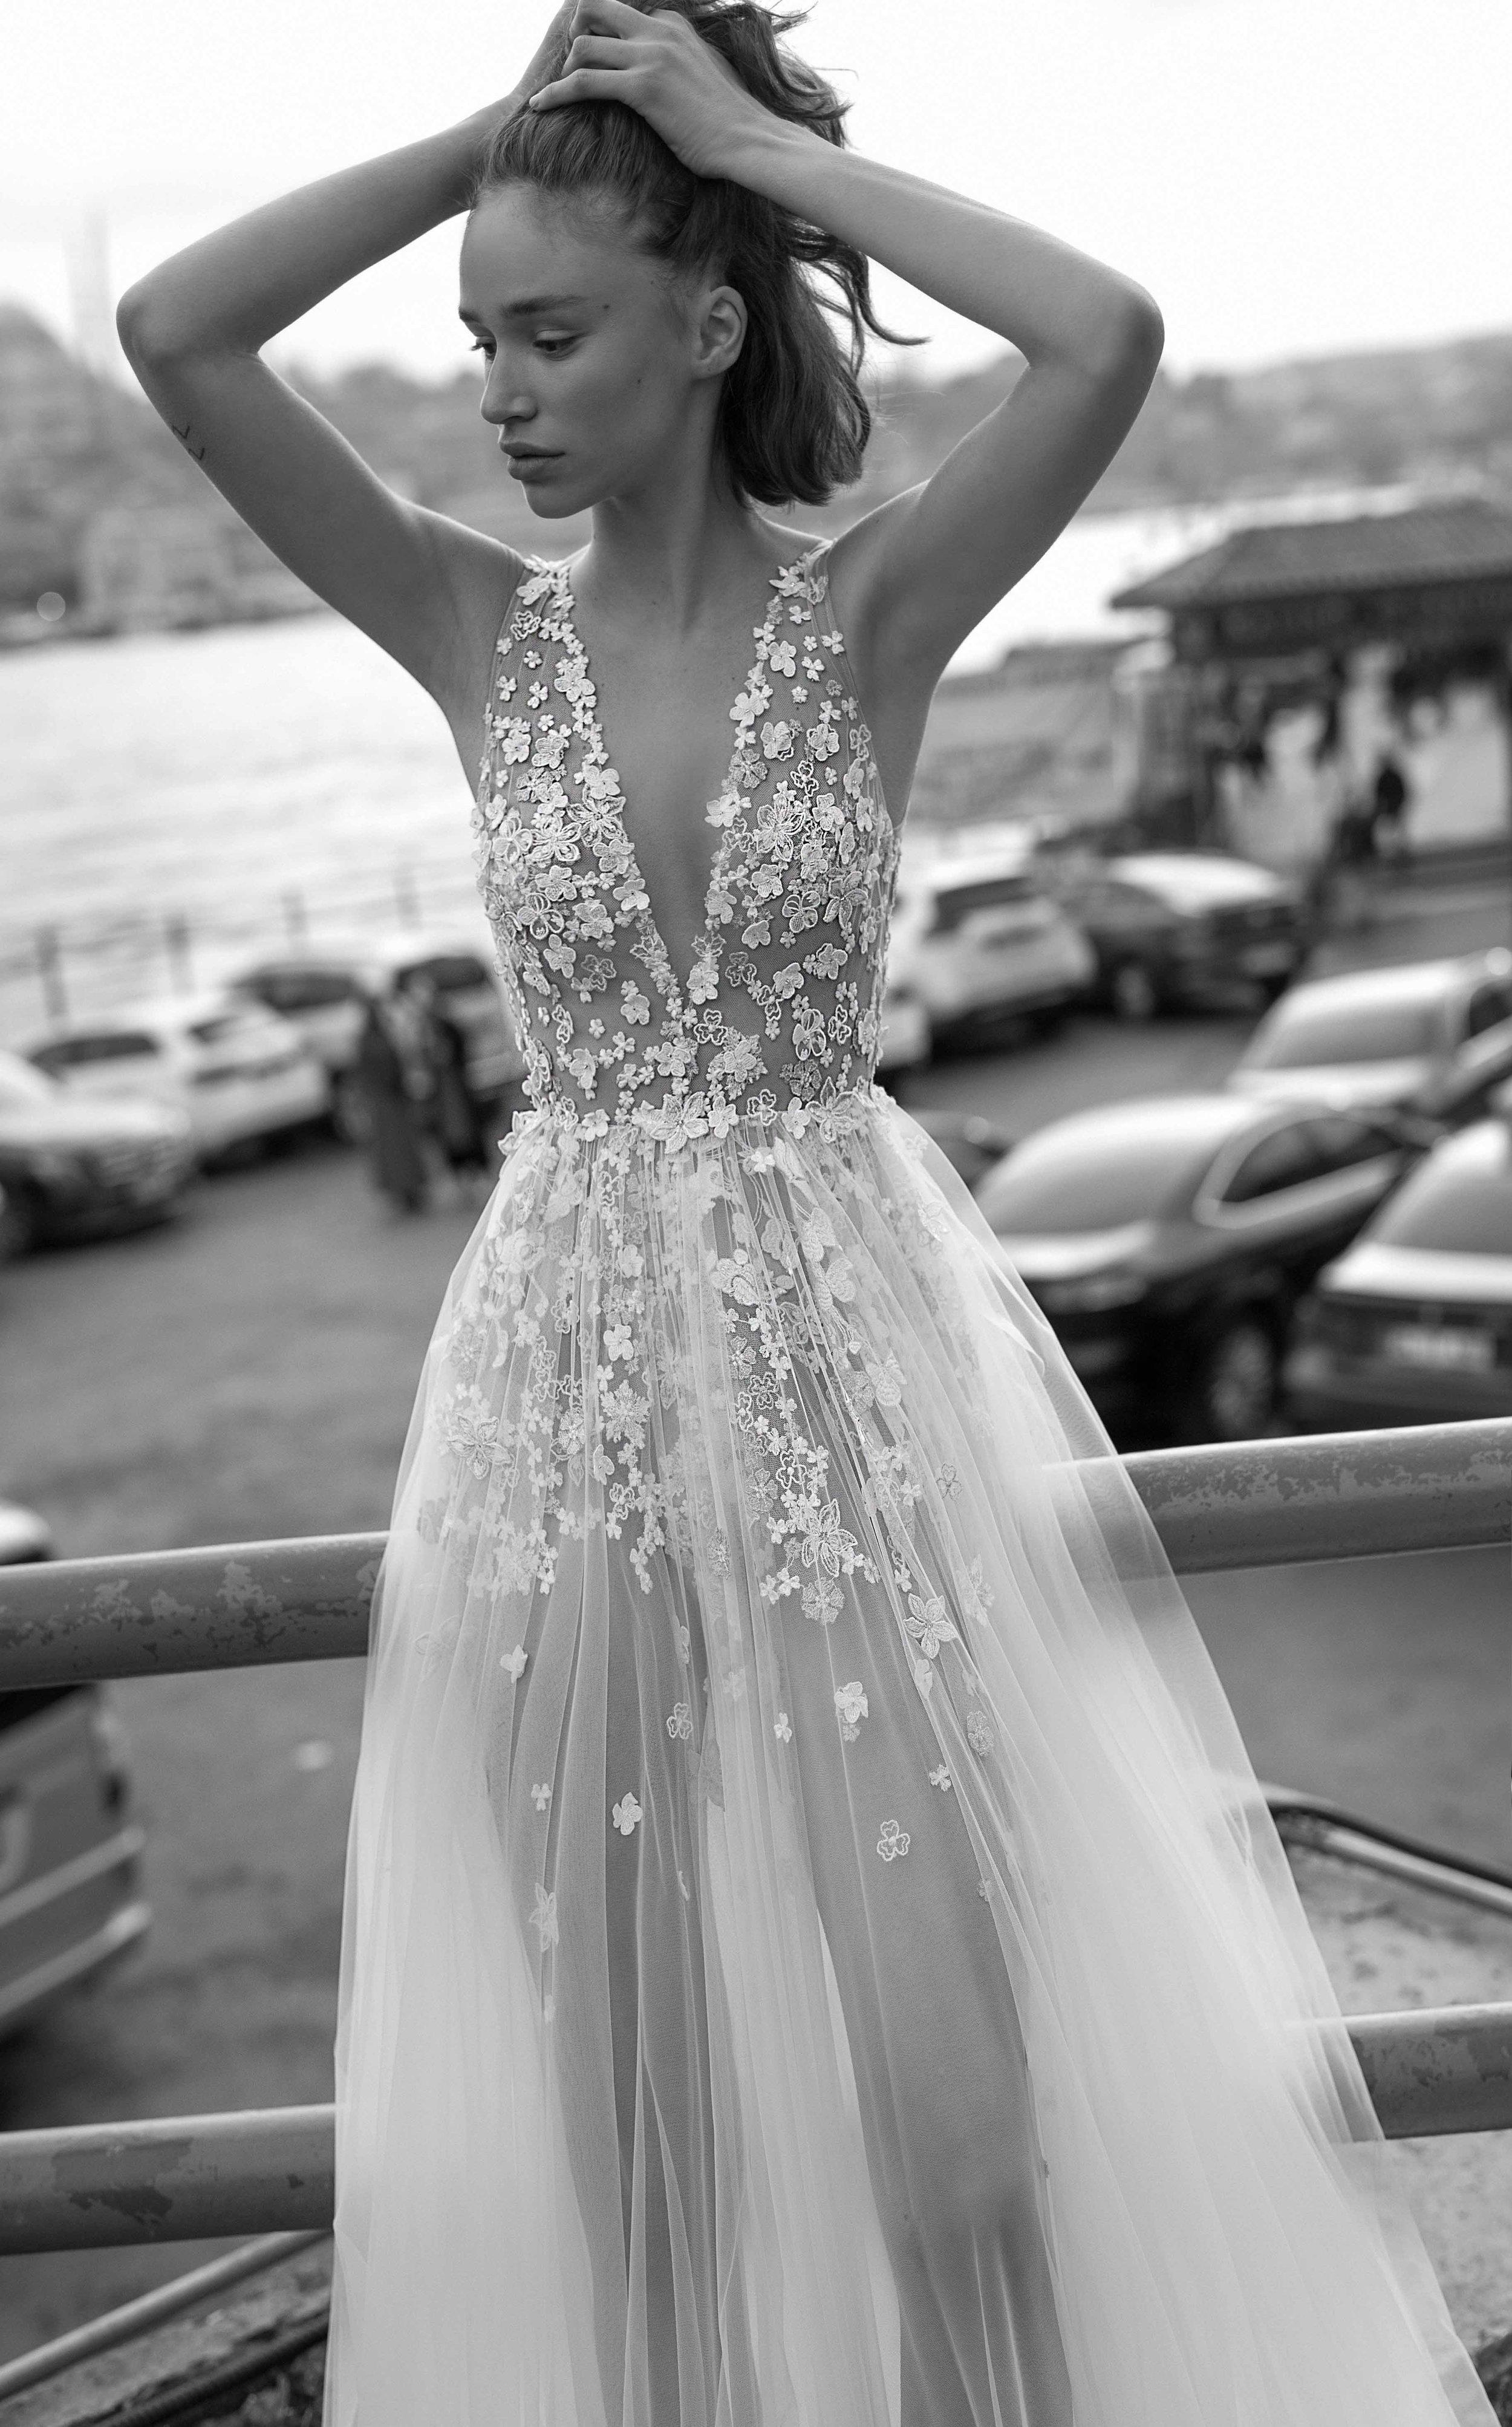 Liz Martinez on the LOVE FIND CO. Bridal Directory